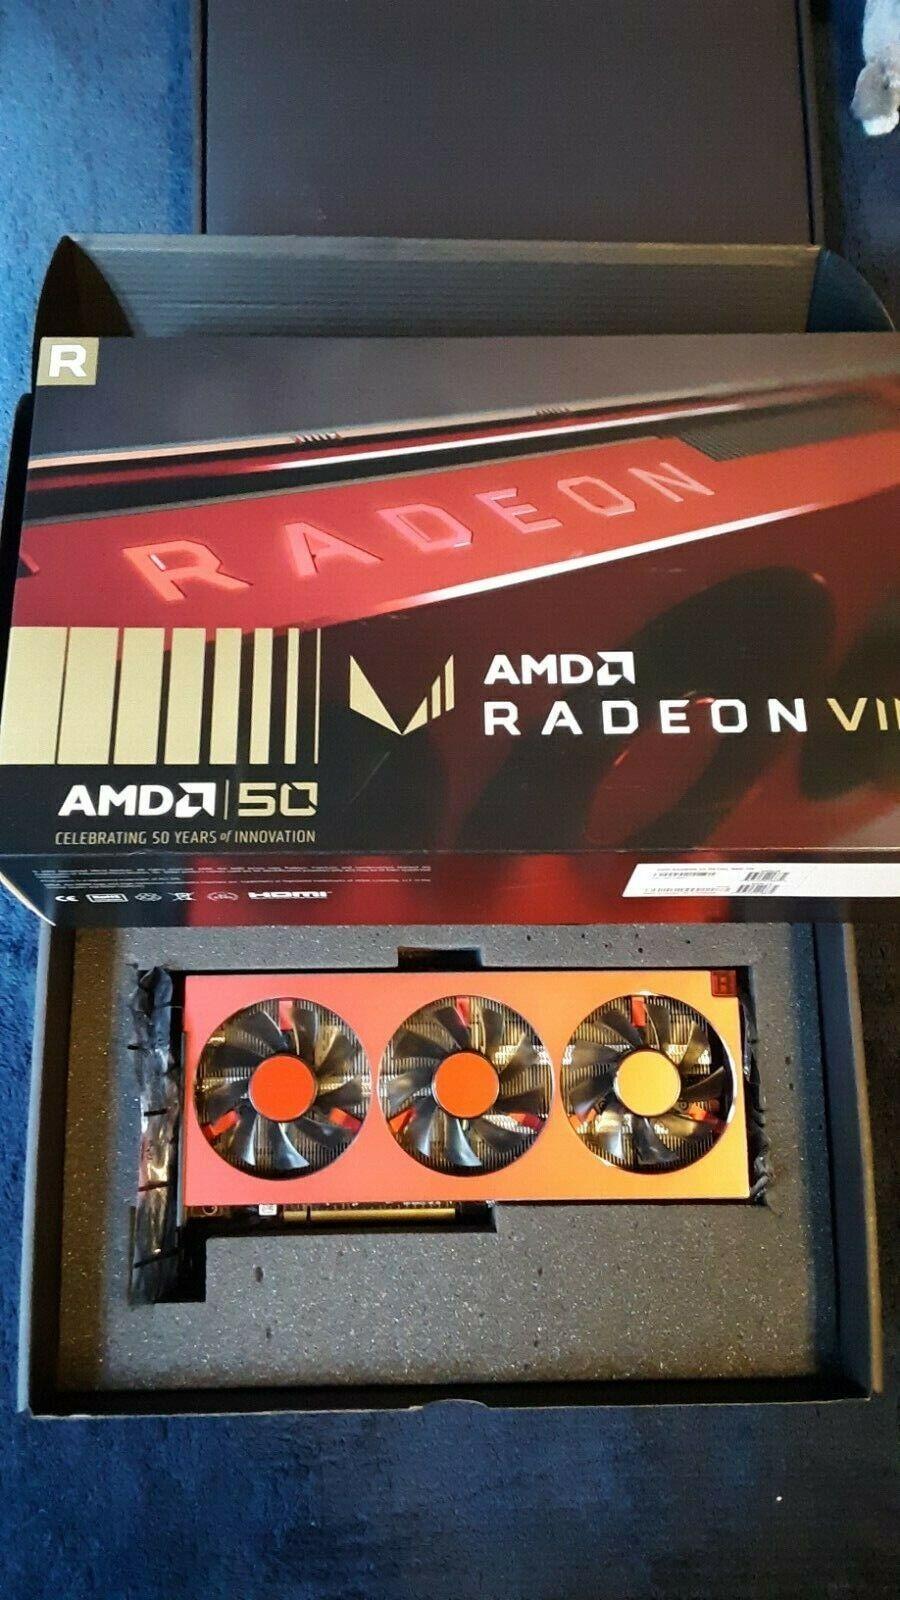 (USED) AMD Radeon VII 50th Anniversary Excellent Condition w/Box